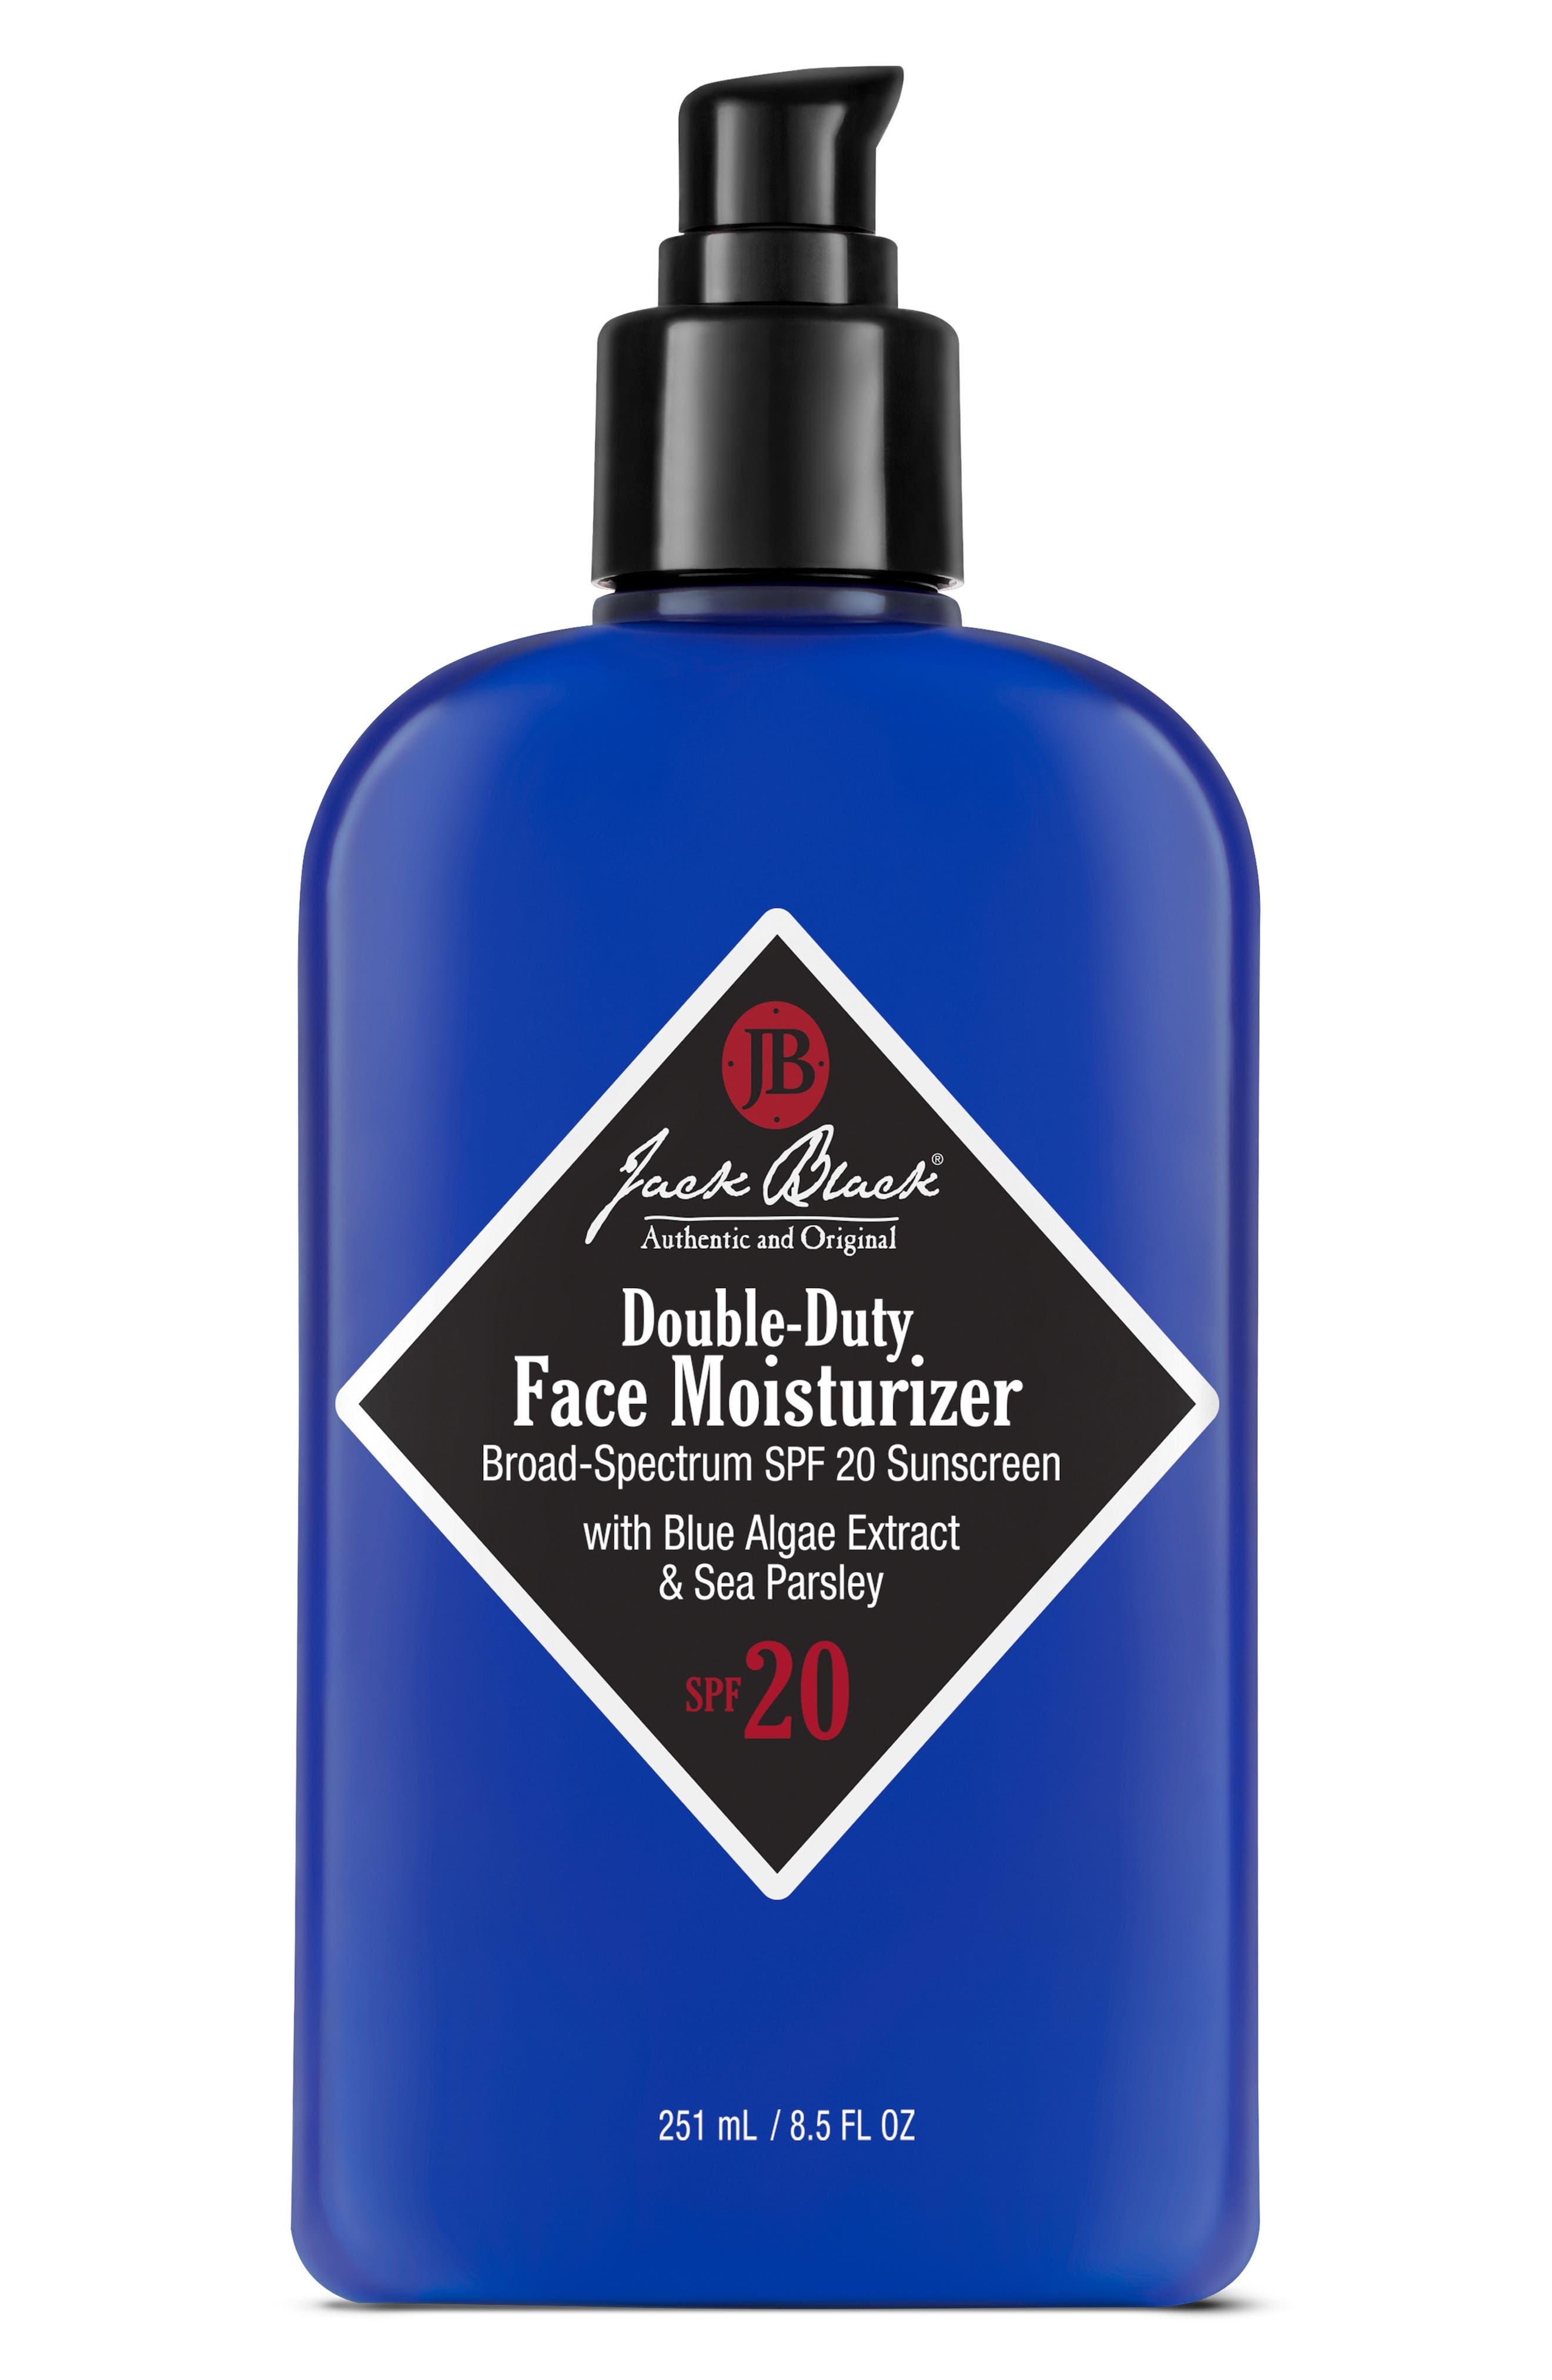 Double-Duty Face Moisturizer Spf 20